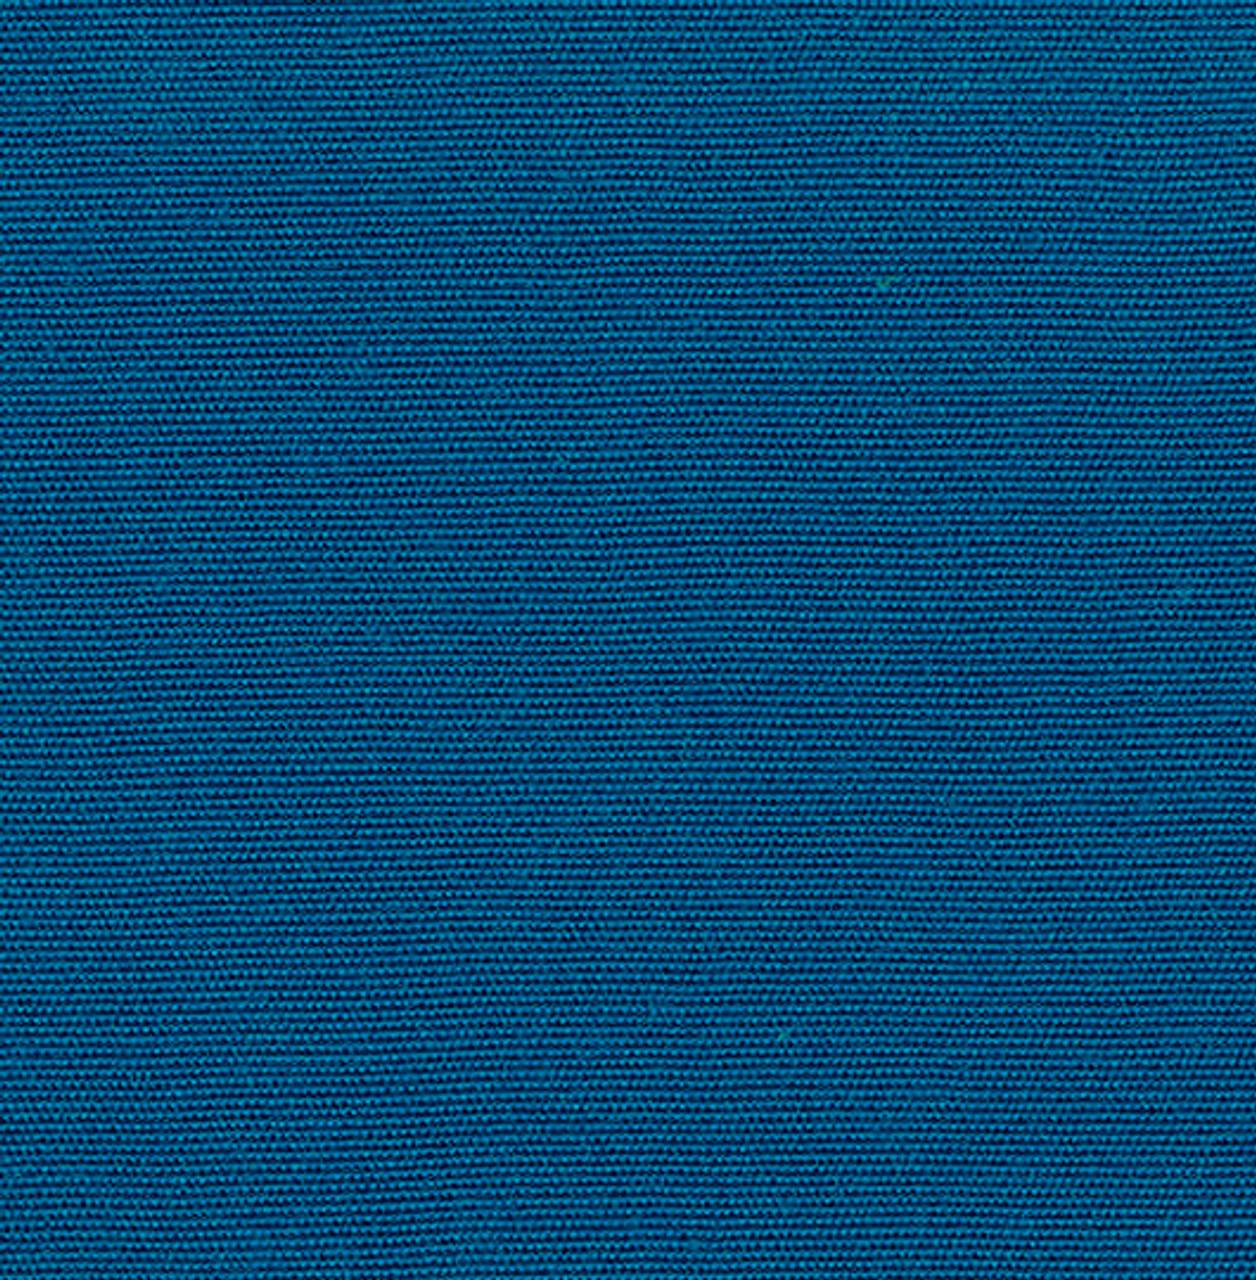 Recacril R-172 Blue